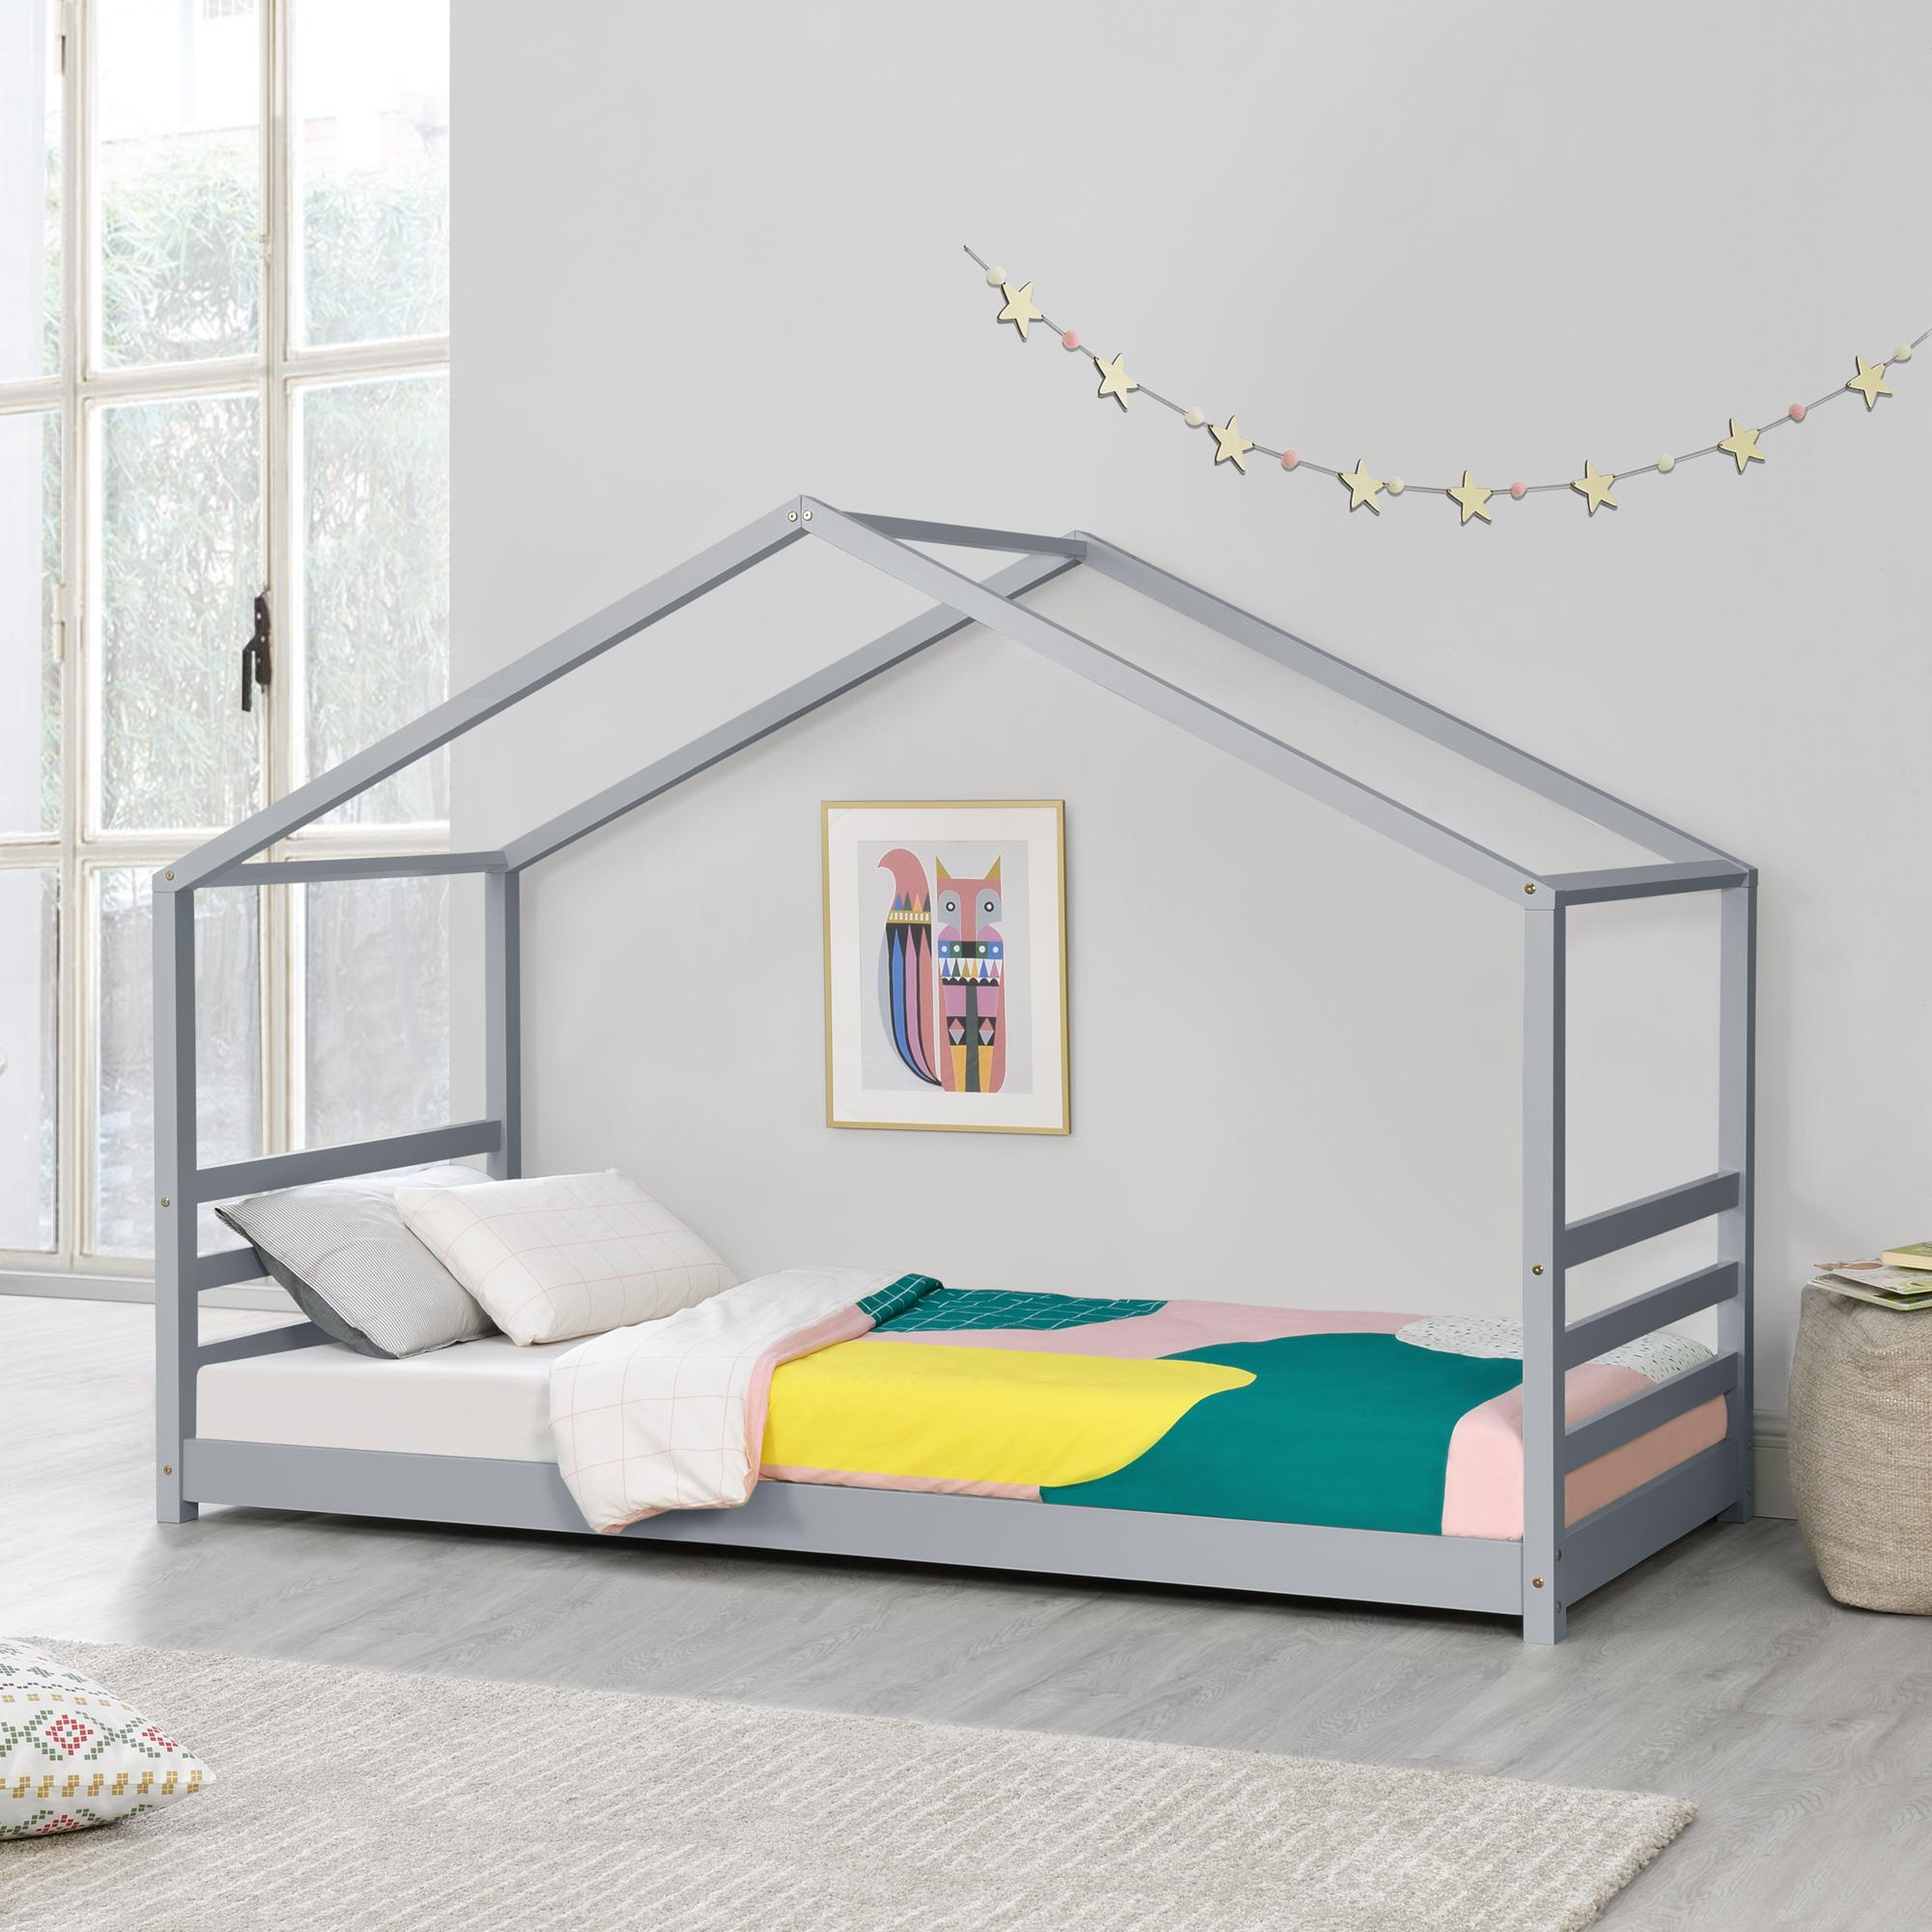 [en.casa] Detská posteľ domček AAKB-8759 sivá 90x200 cm